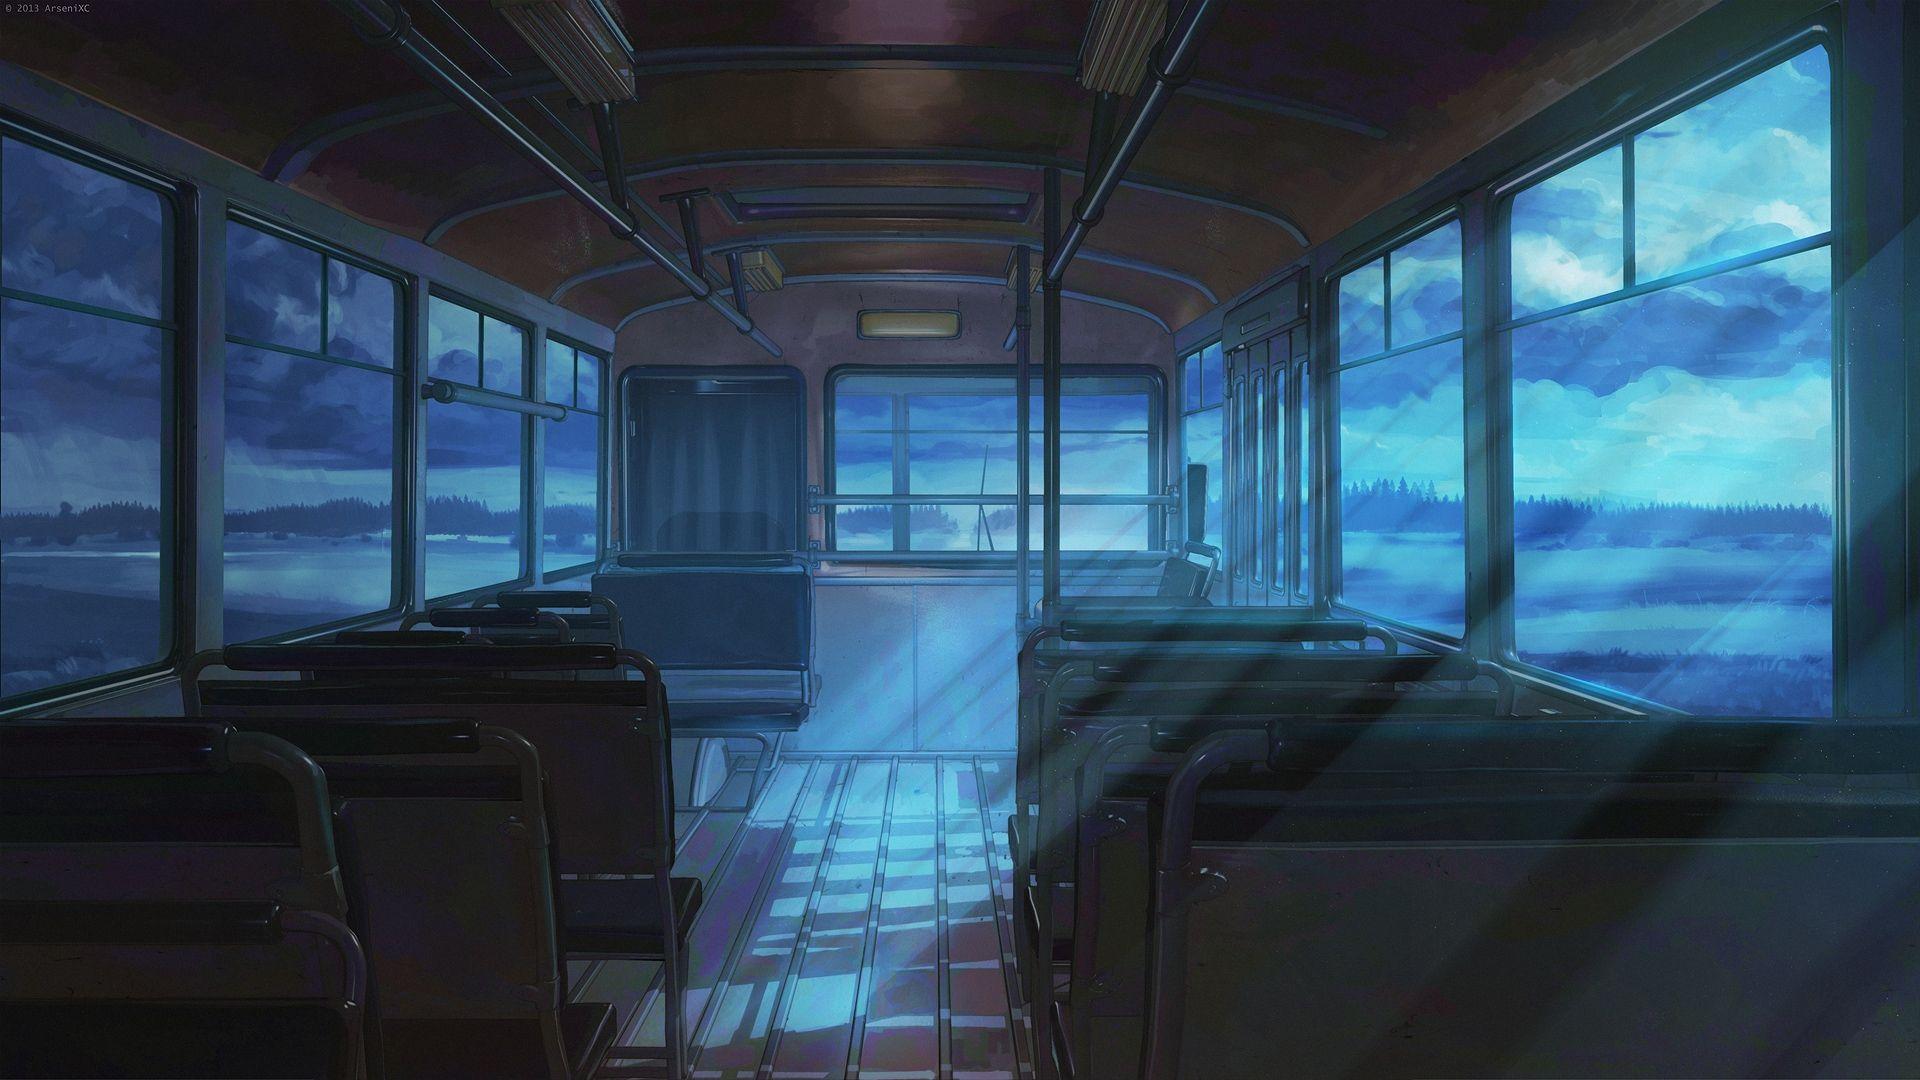 Everlasting Summer Anime Scenery Anime Scenery Wallpaper Anime Backgrounds Wallpapers